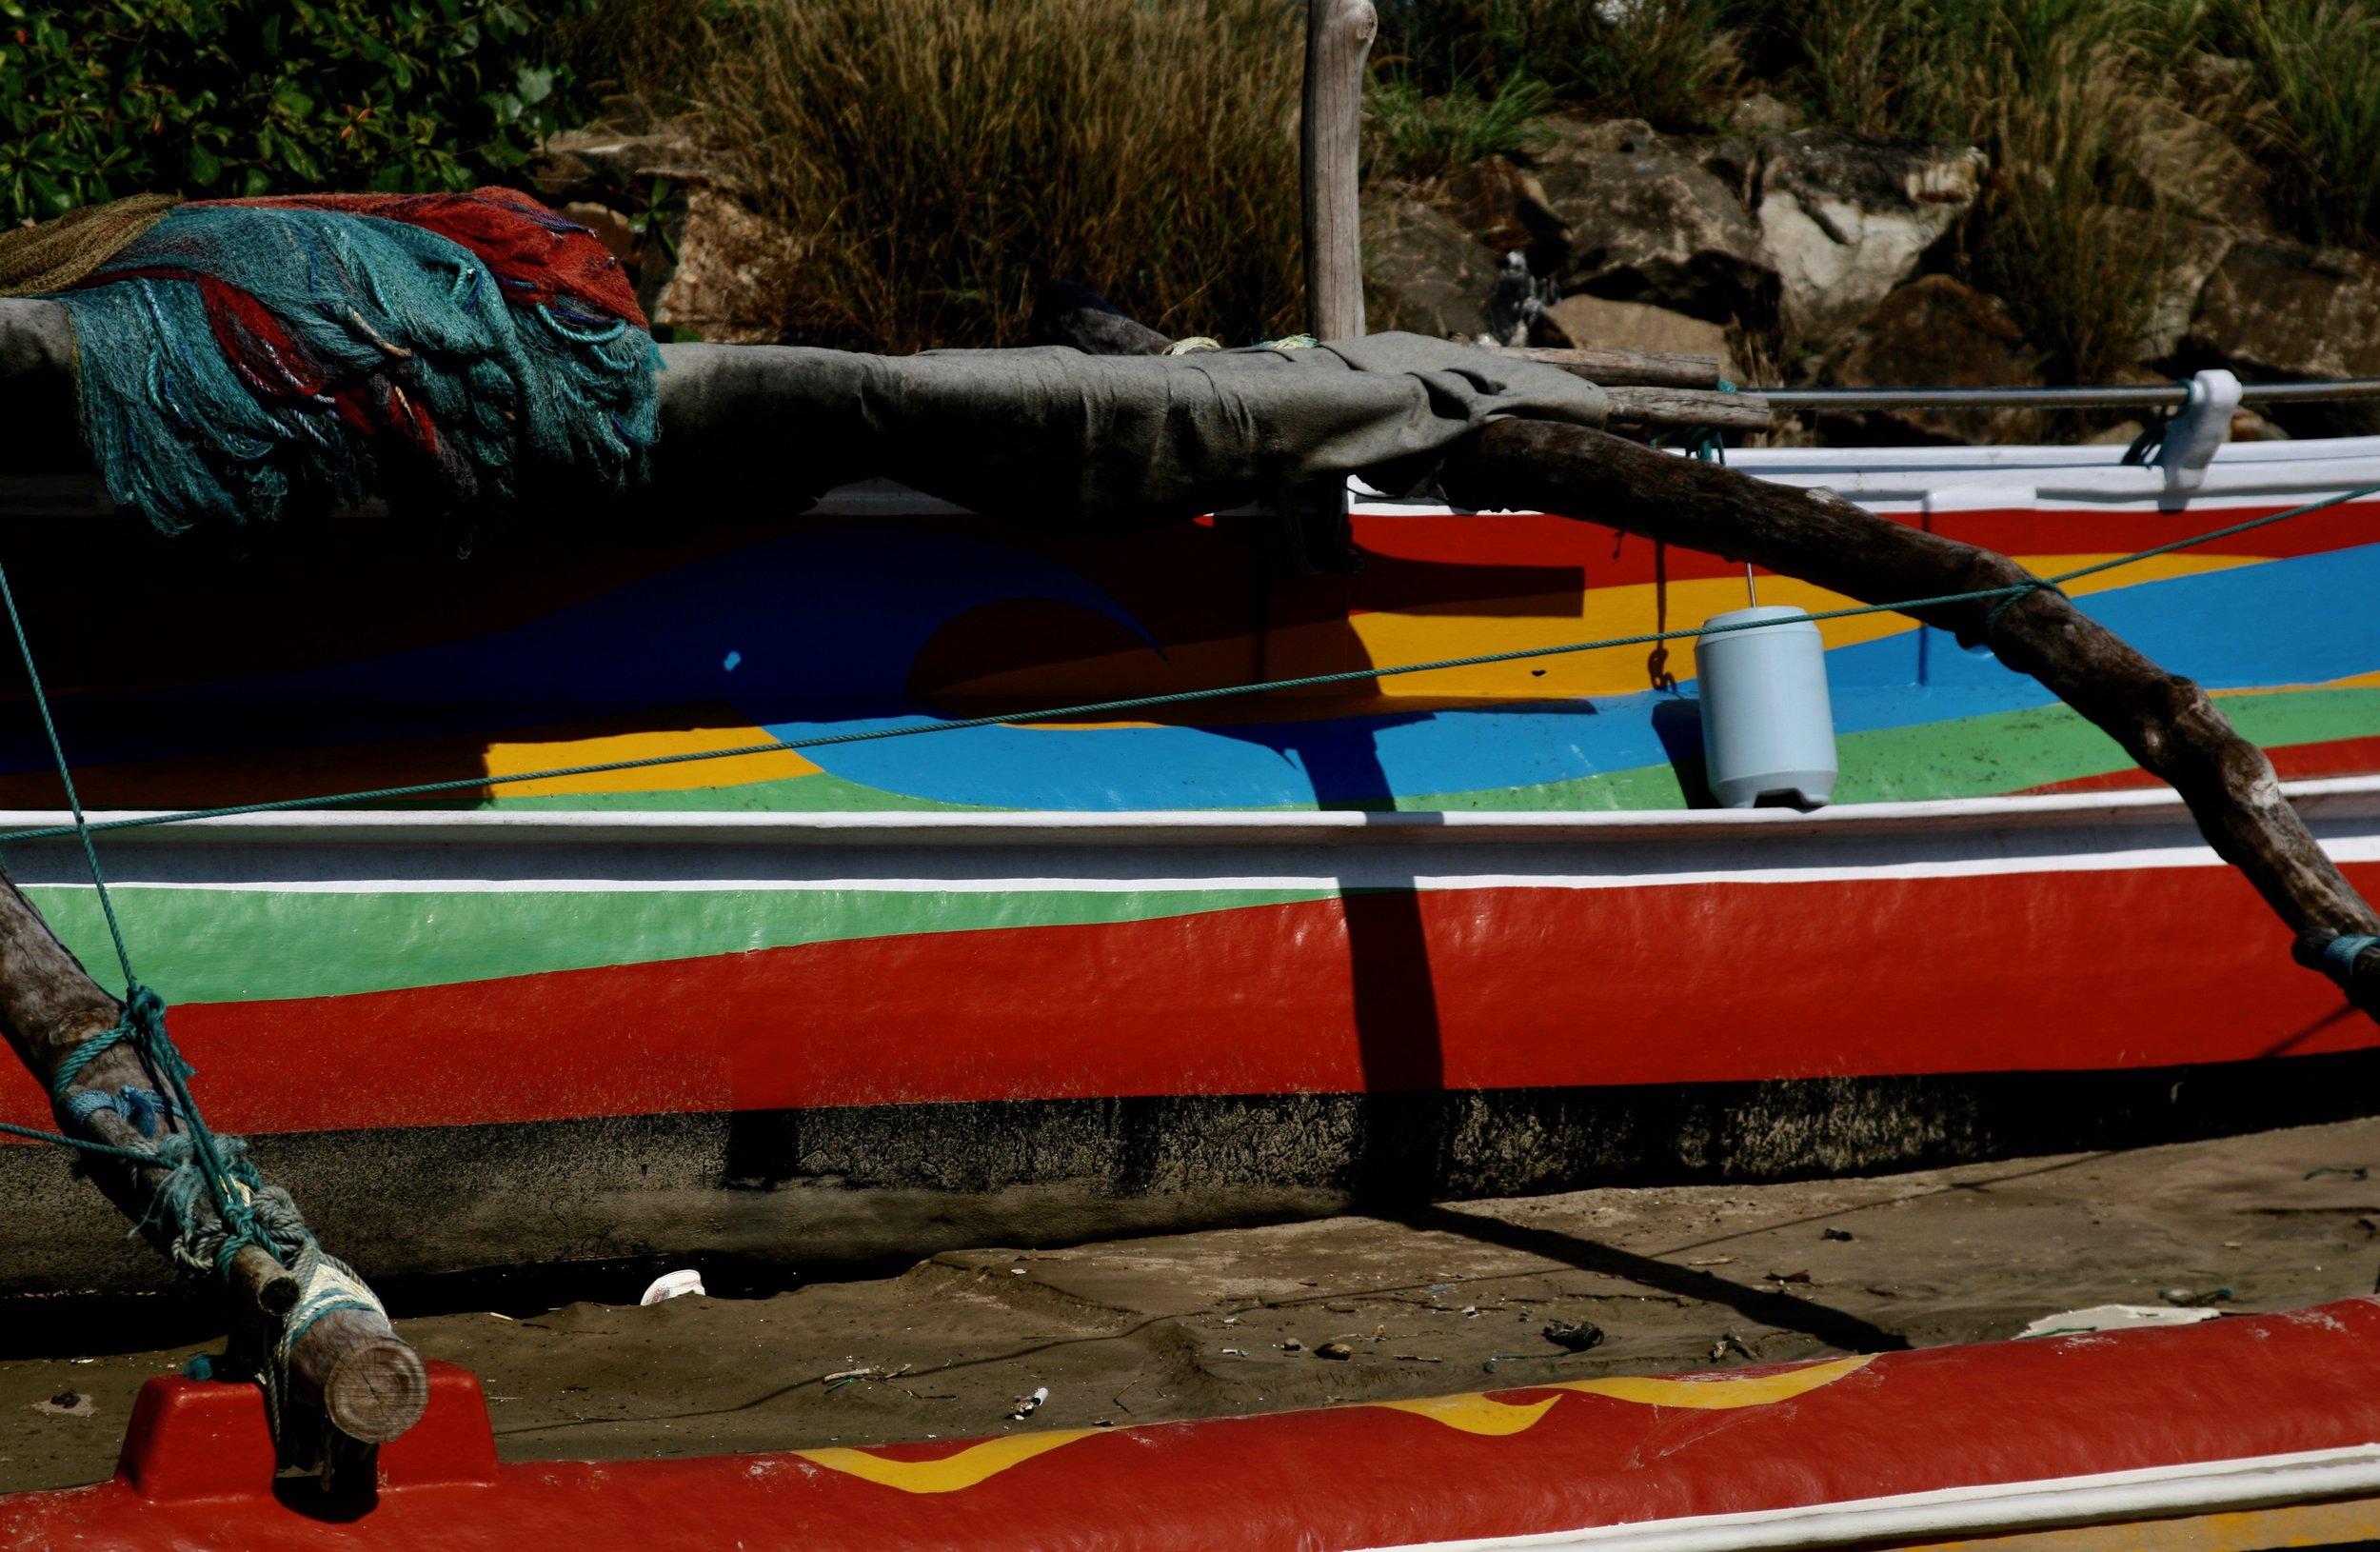 Things-Galle-Boats 2.jpg